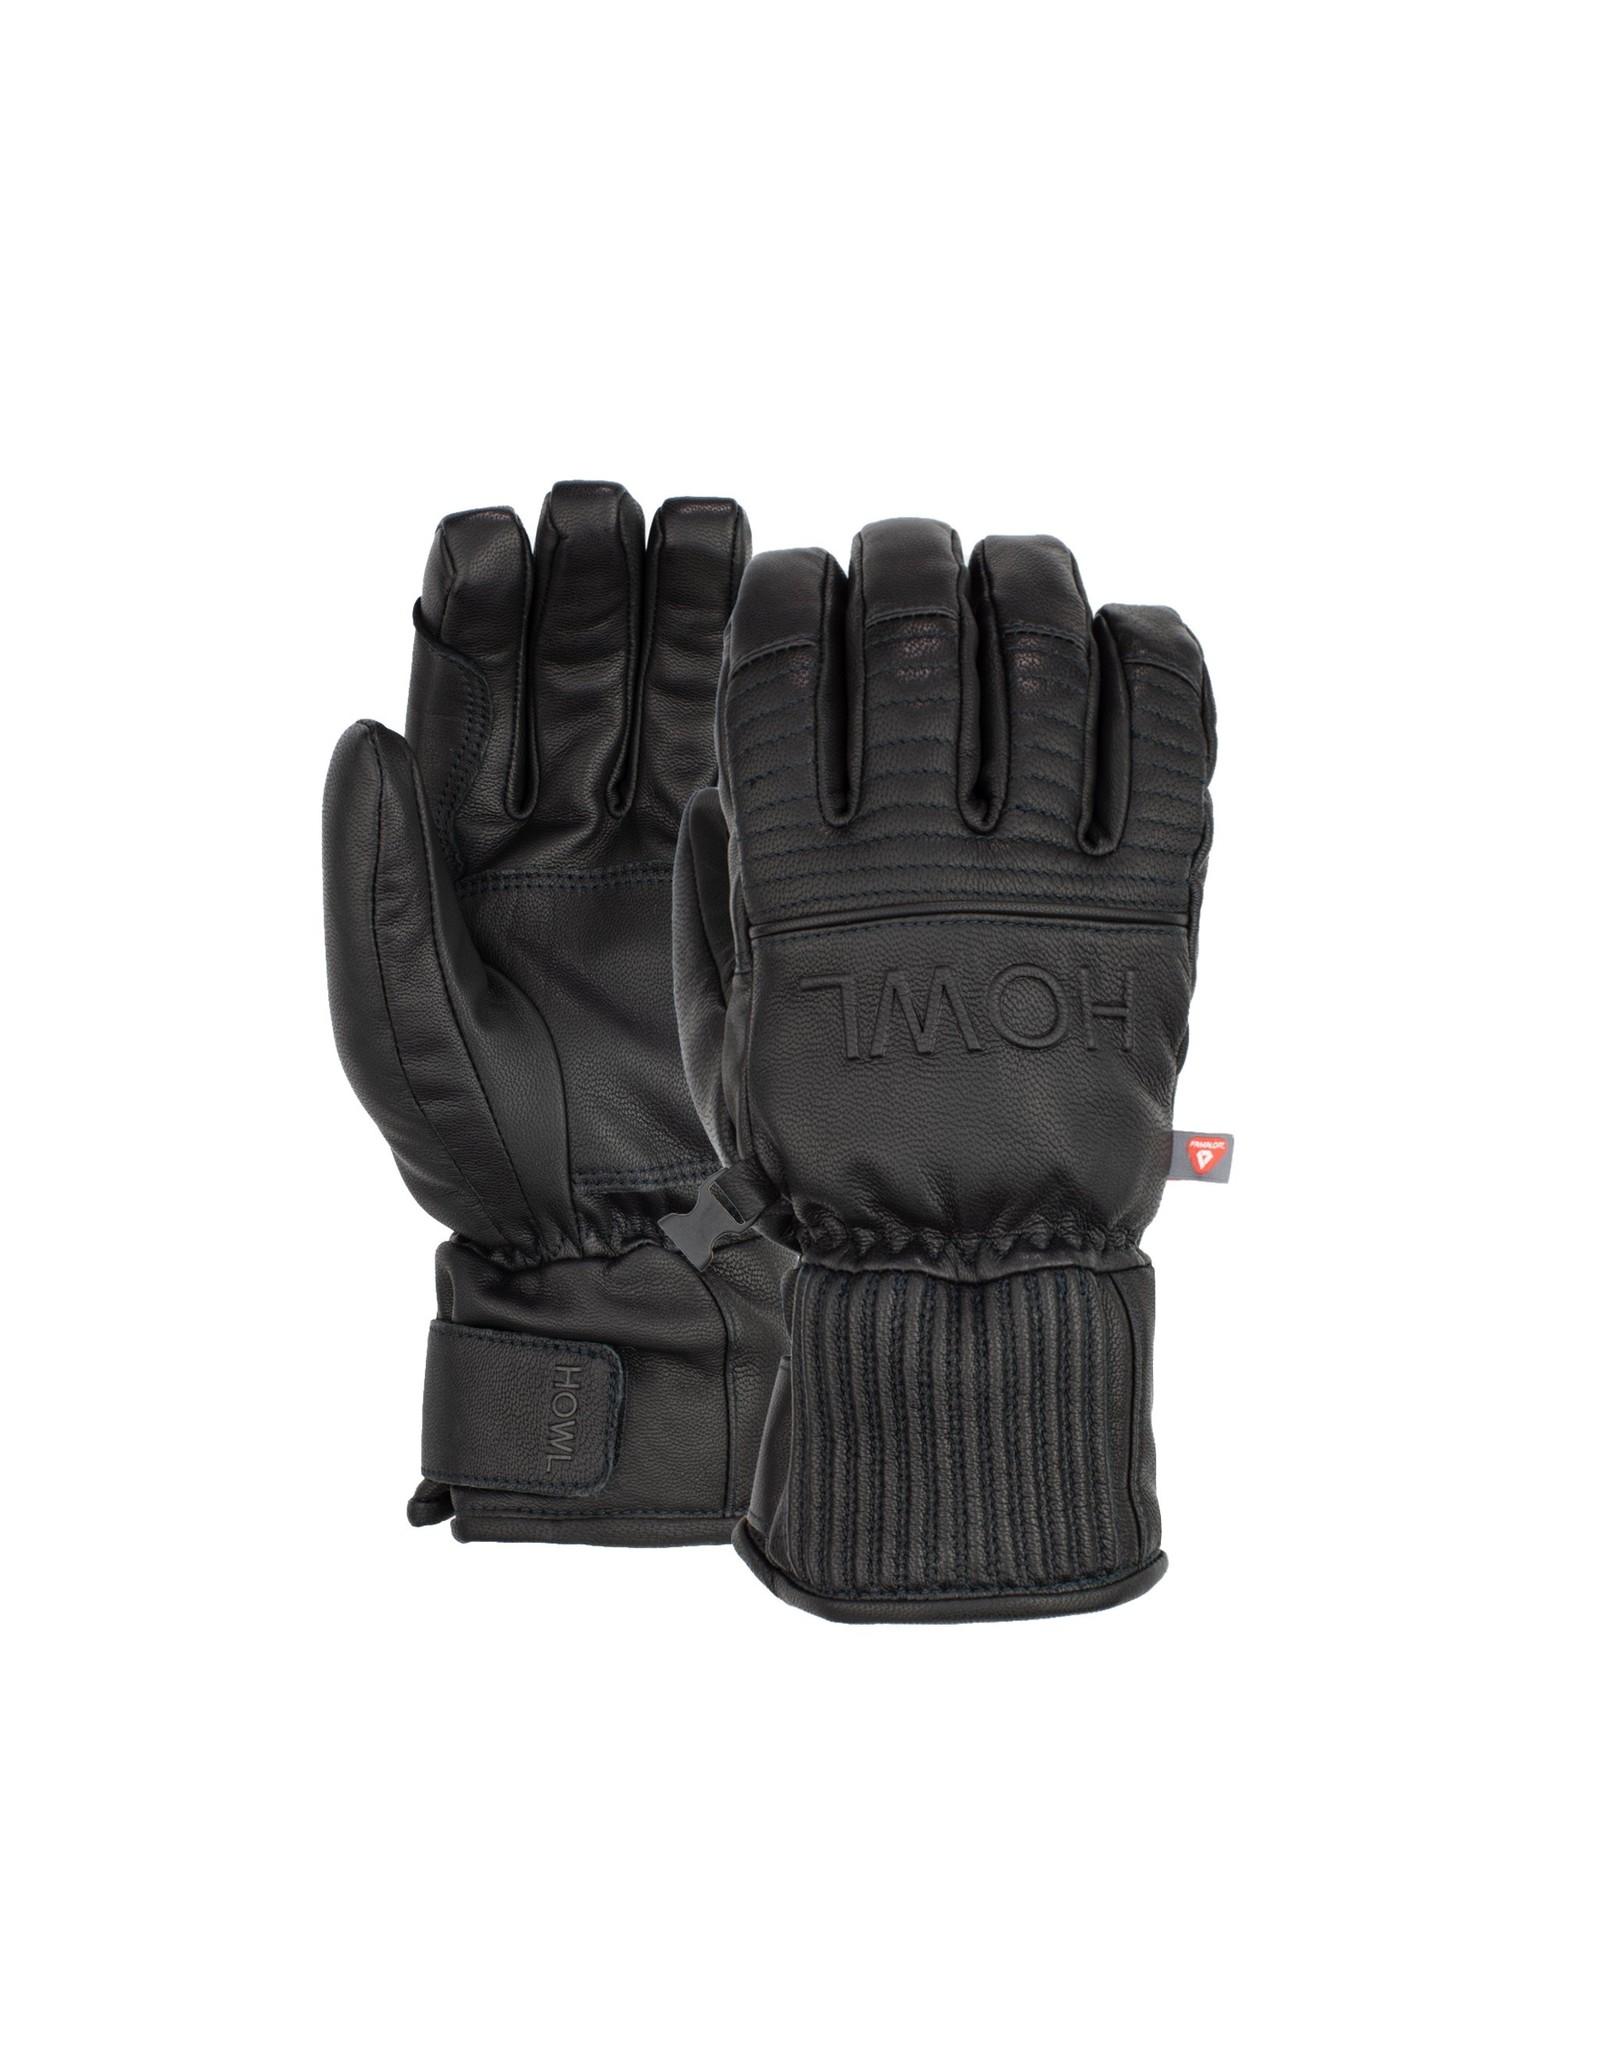 Howl Houston Glove